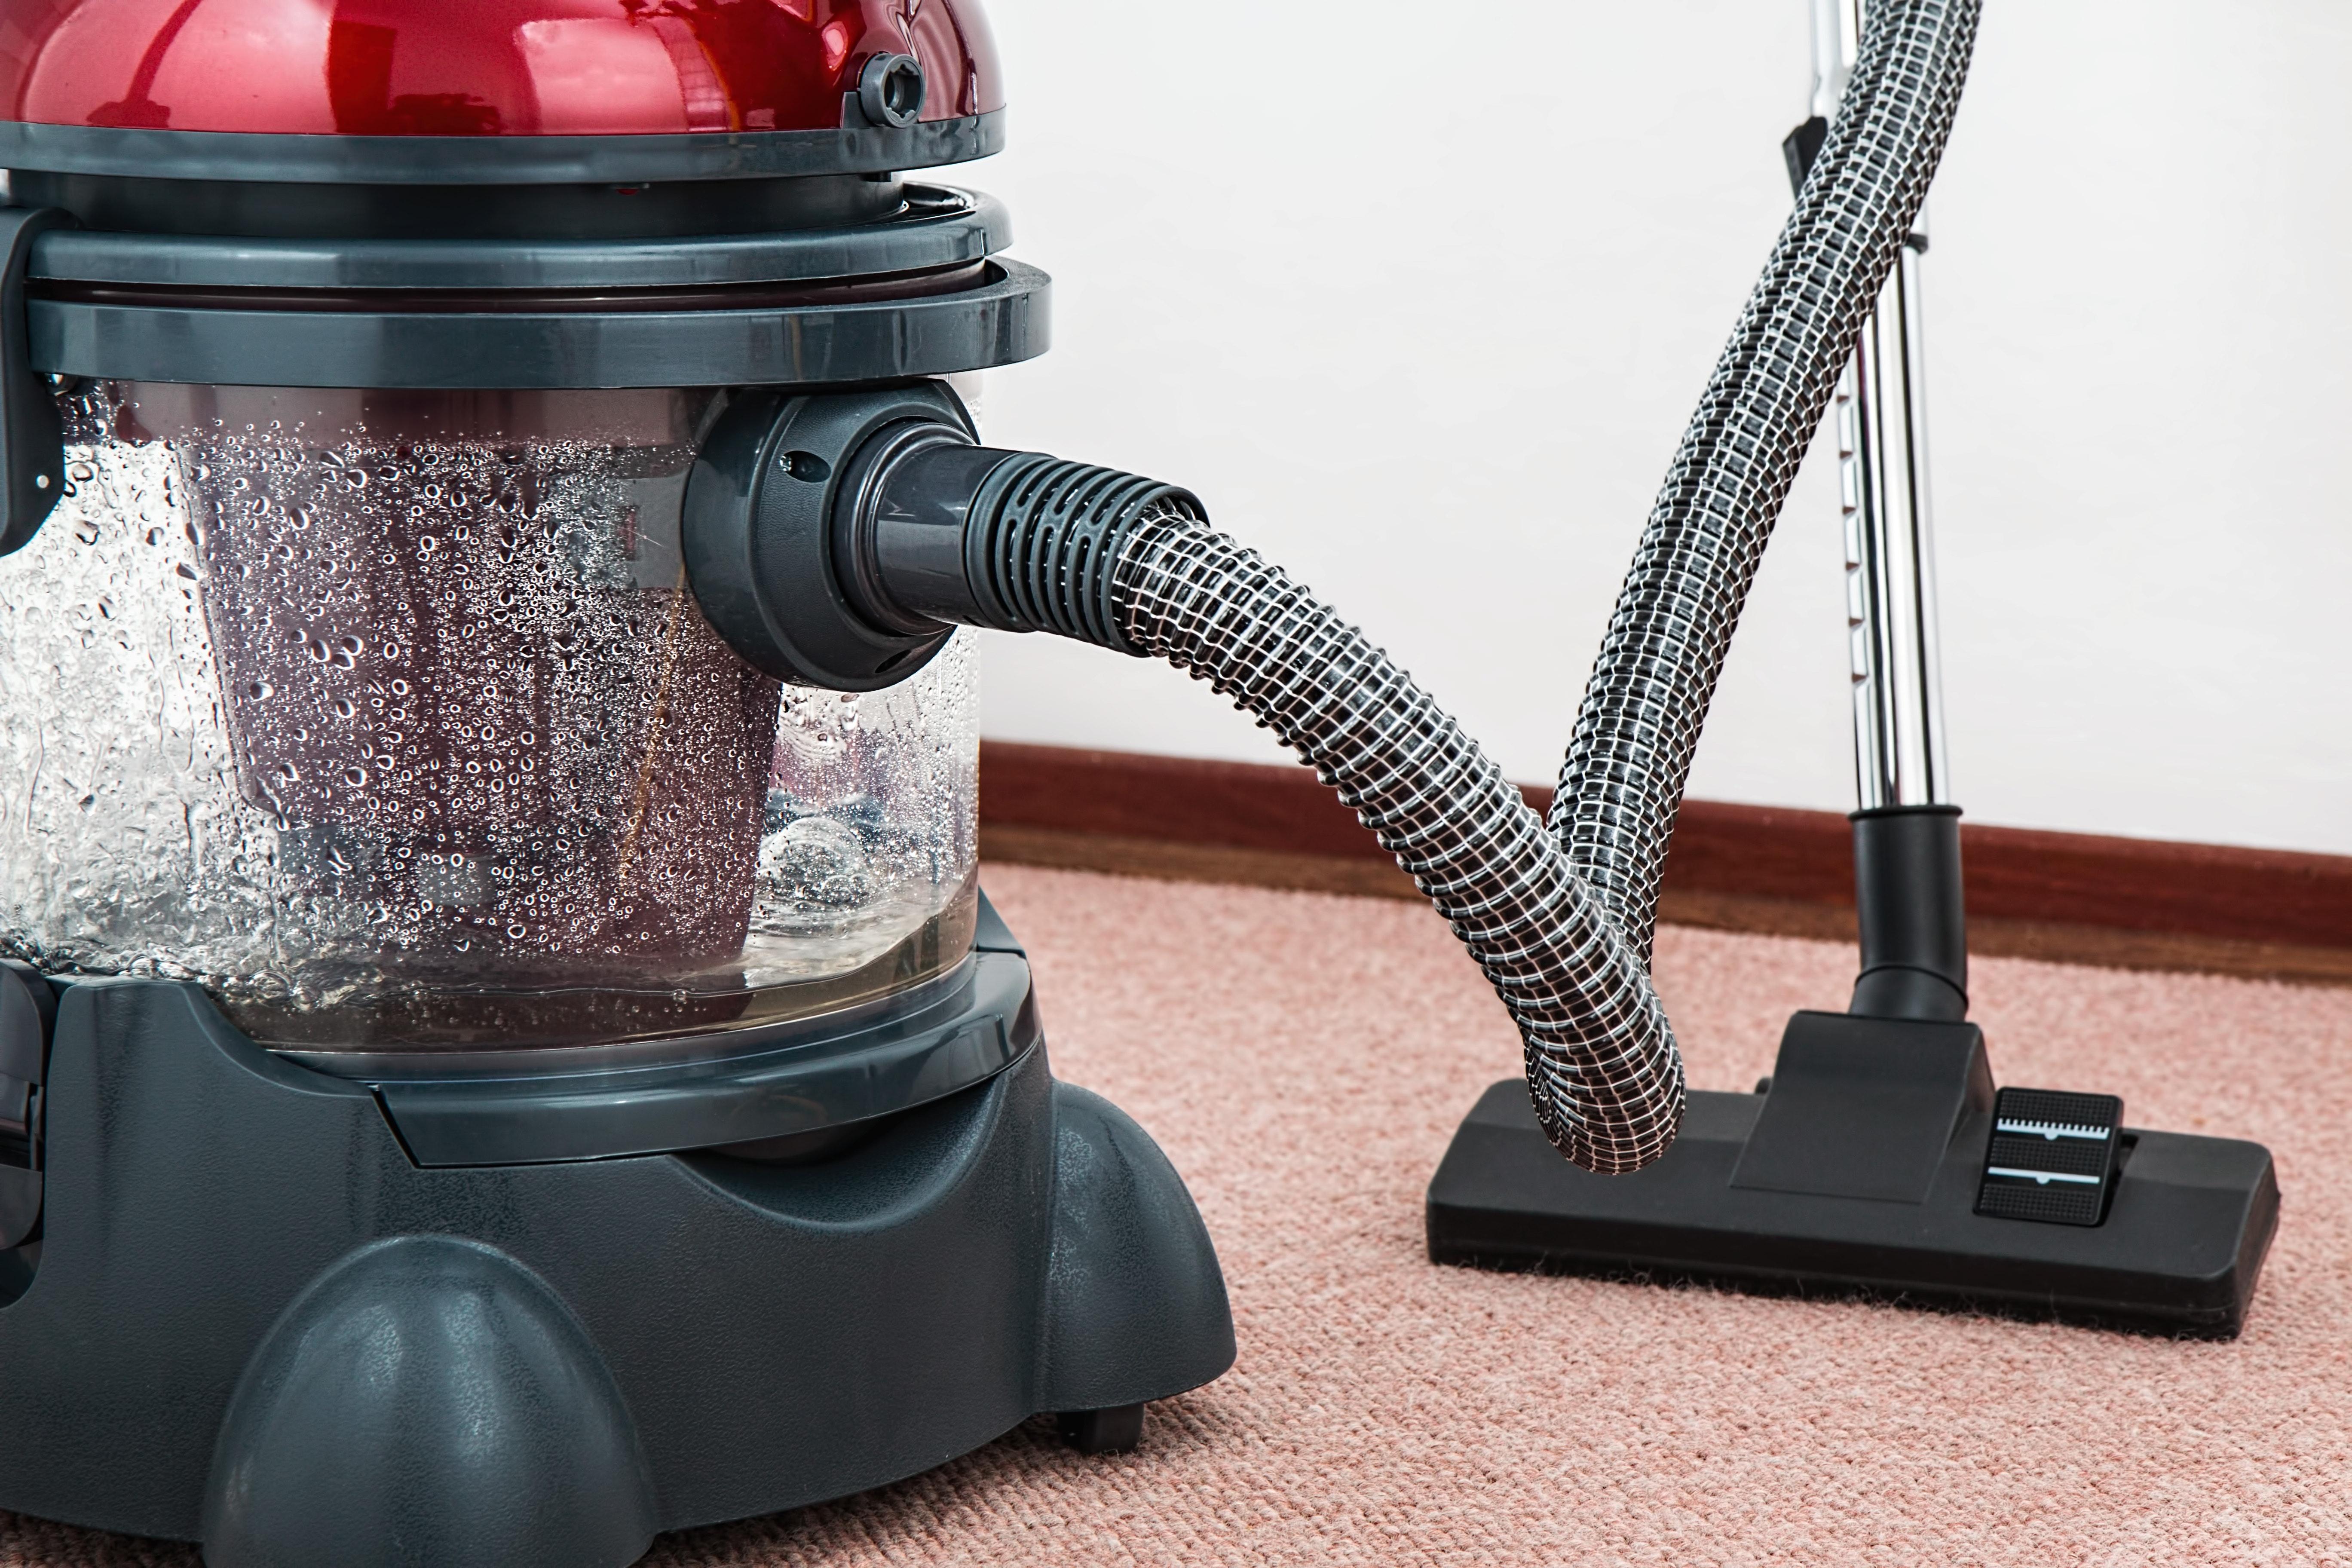 appliance-carpet-chores-38325 (1)